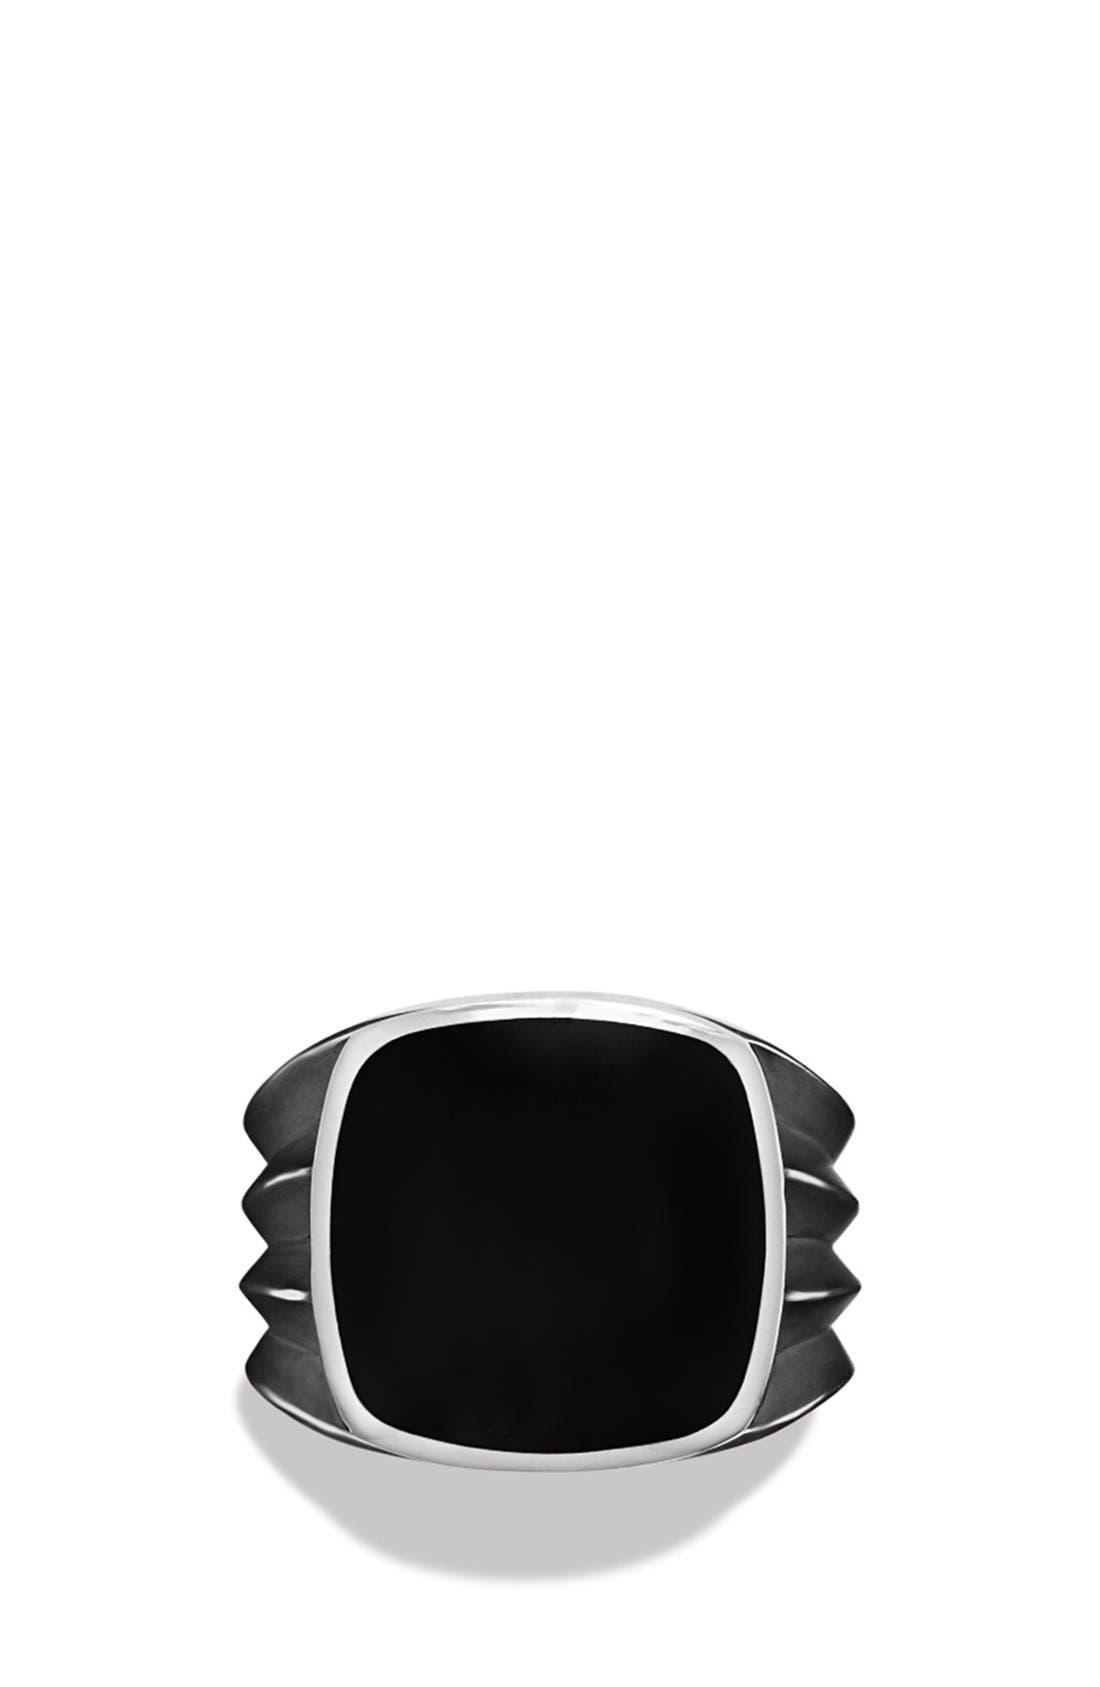 'Royal Cord' Knife Edge Signet Ring with Black Onyx,                             Alternate thumbnail 3, color,                             Black Onyx